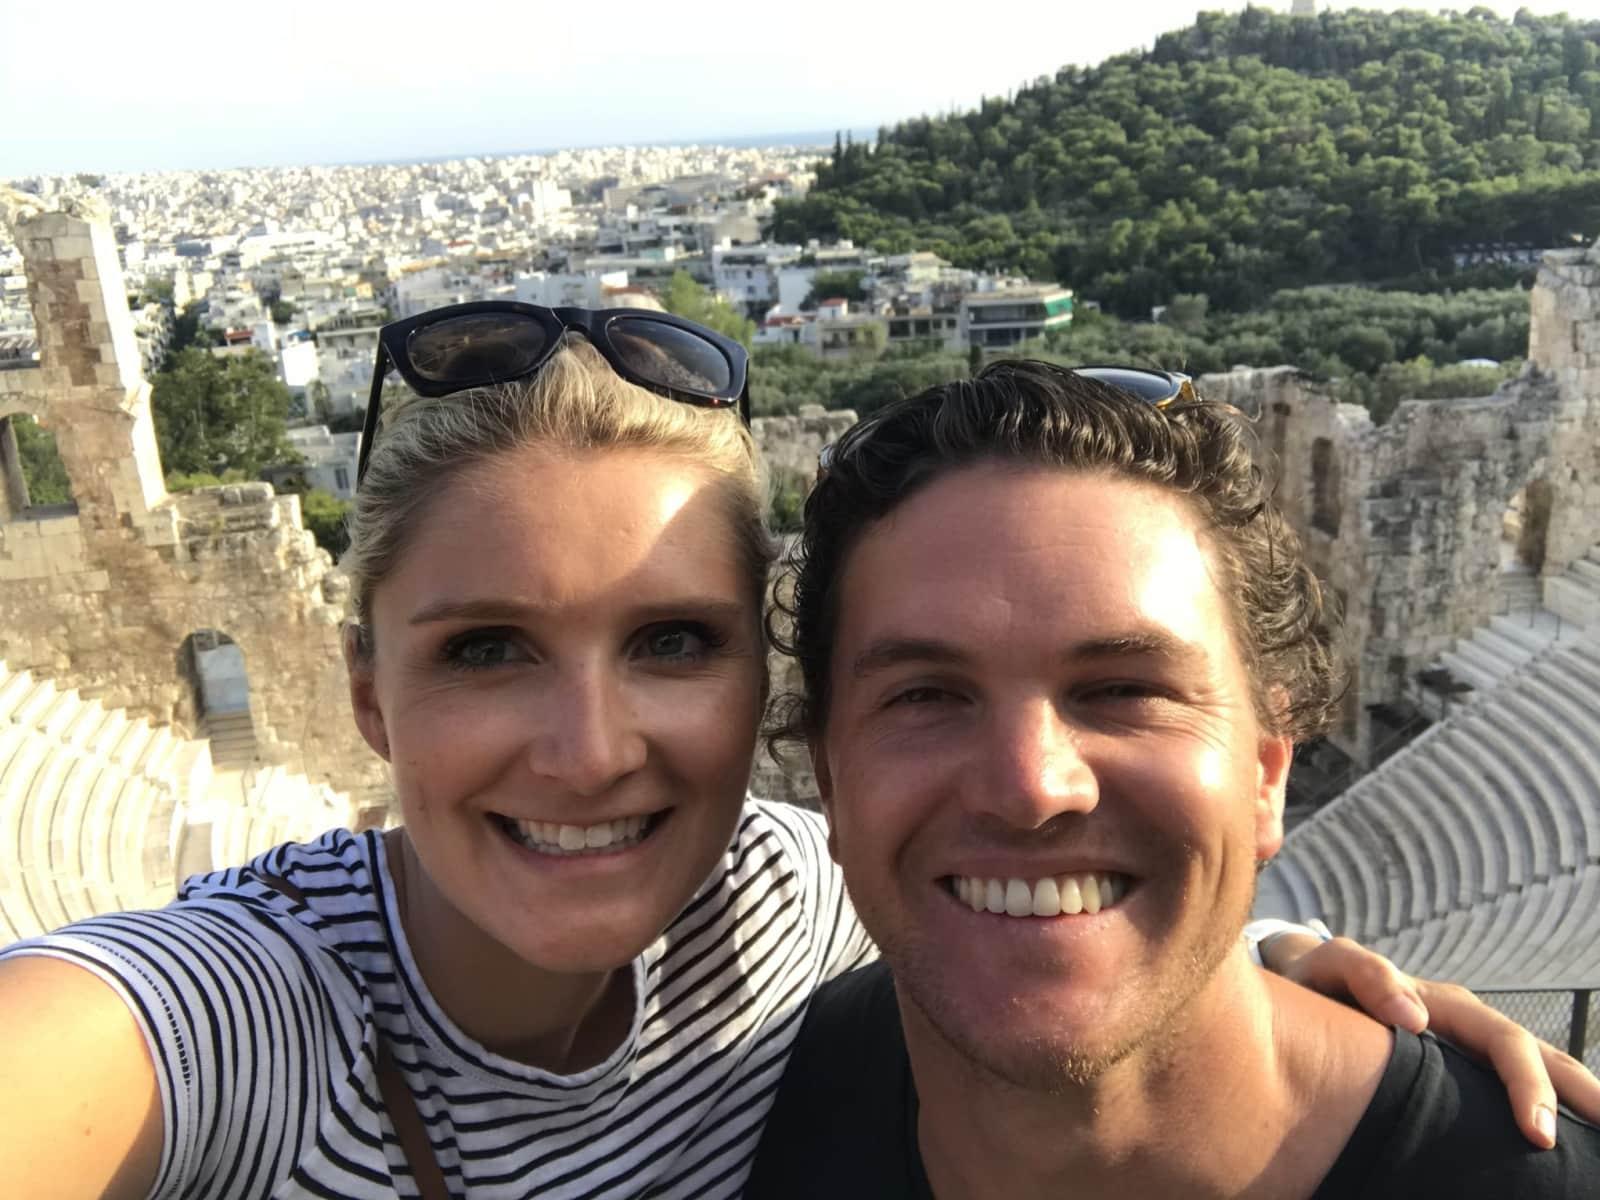 Gemma & John from Sydney, New South Wales, Australia